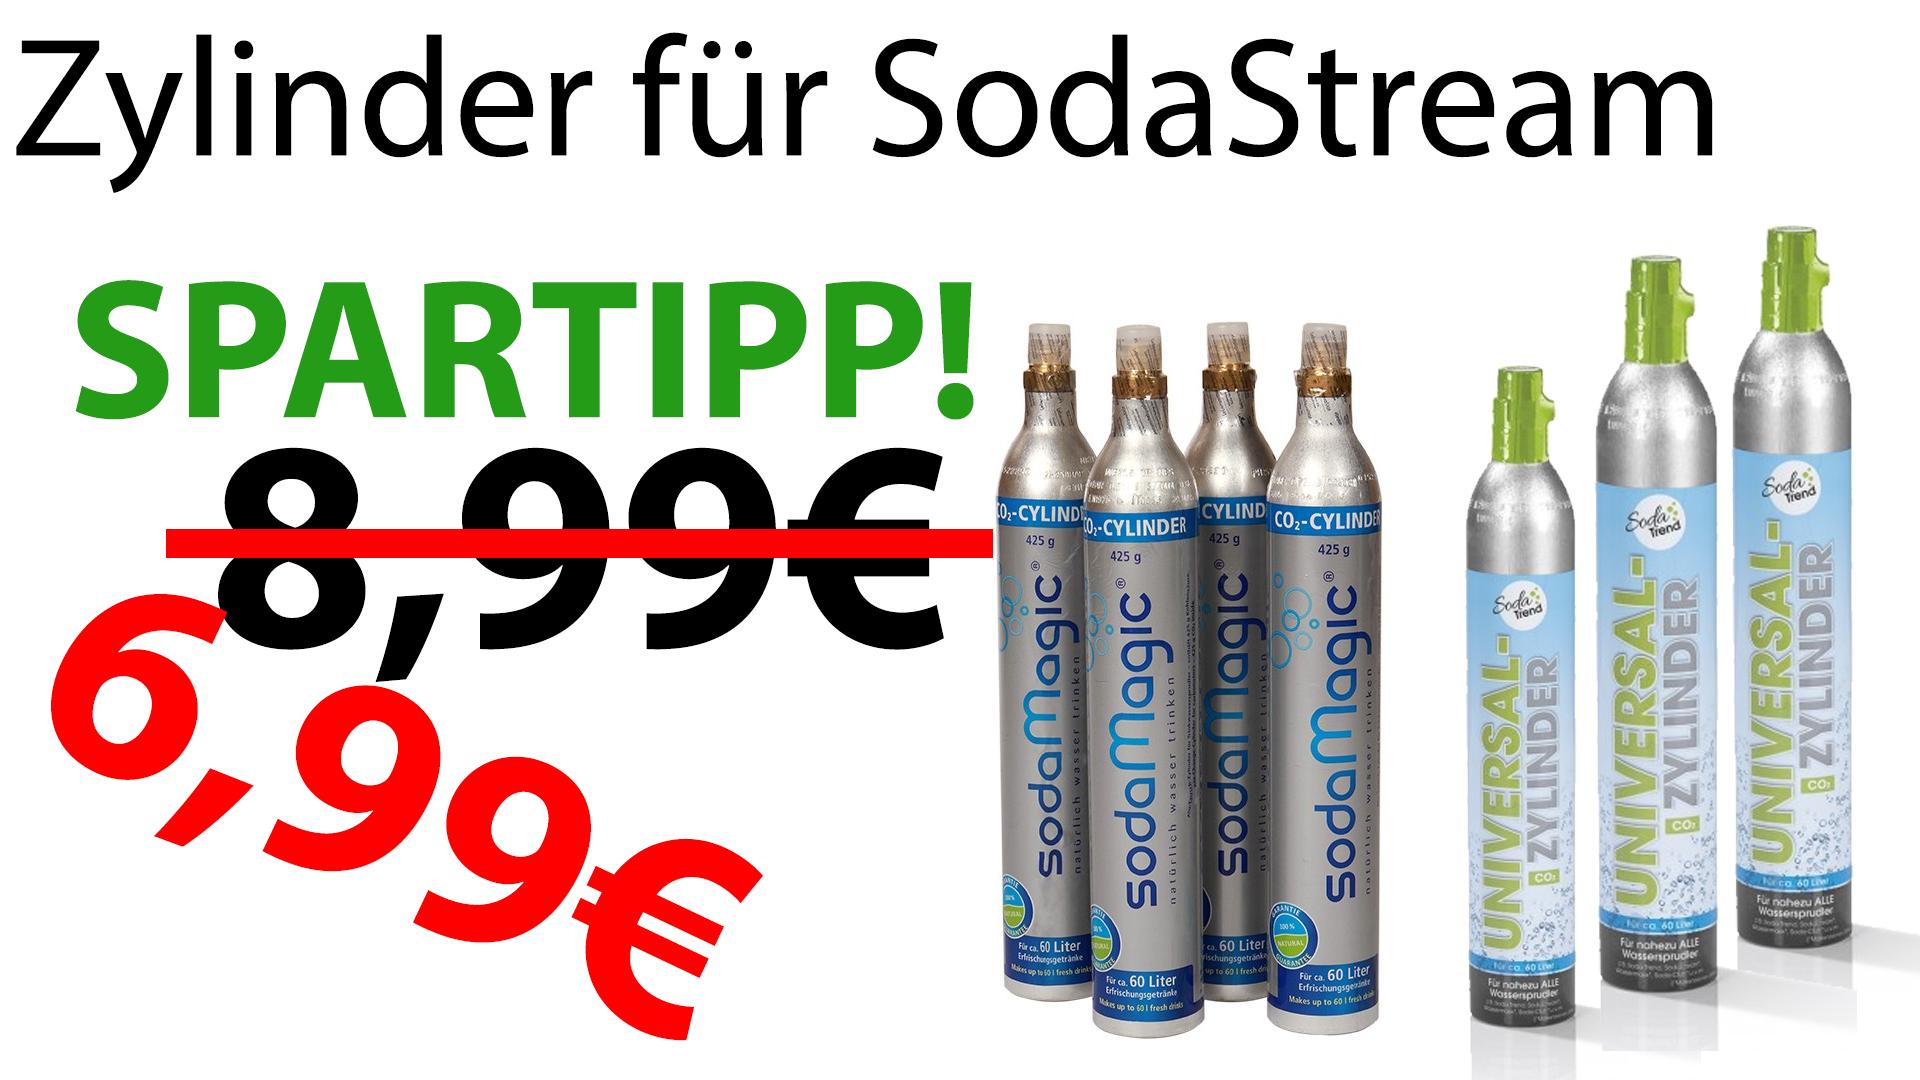 Sodastream Co2 Zylinder Preis